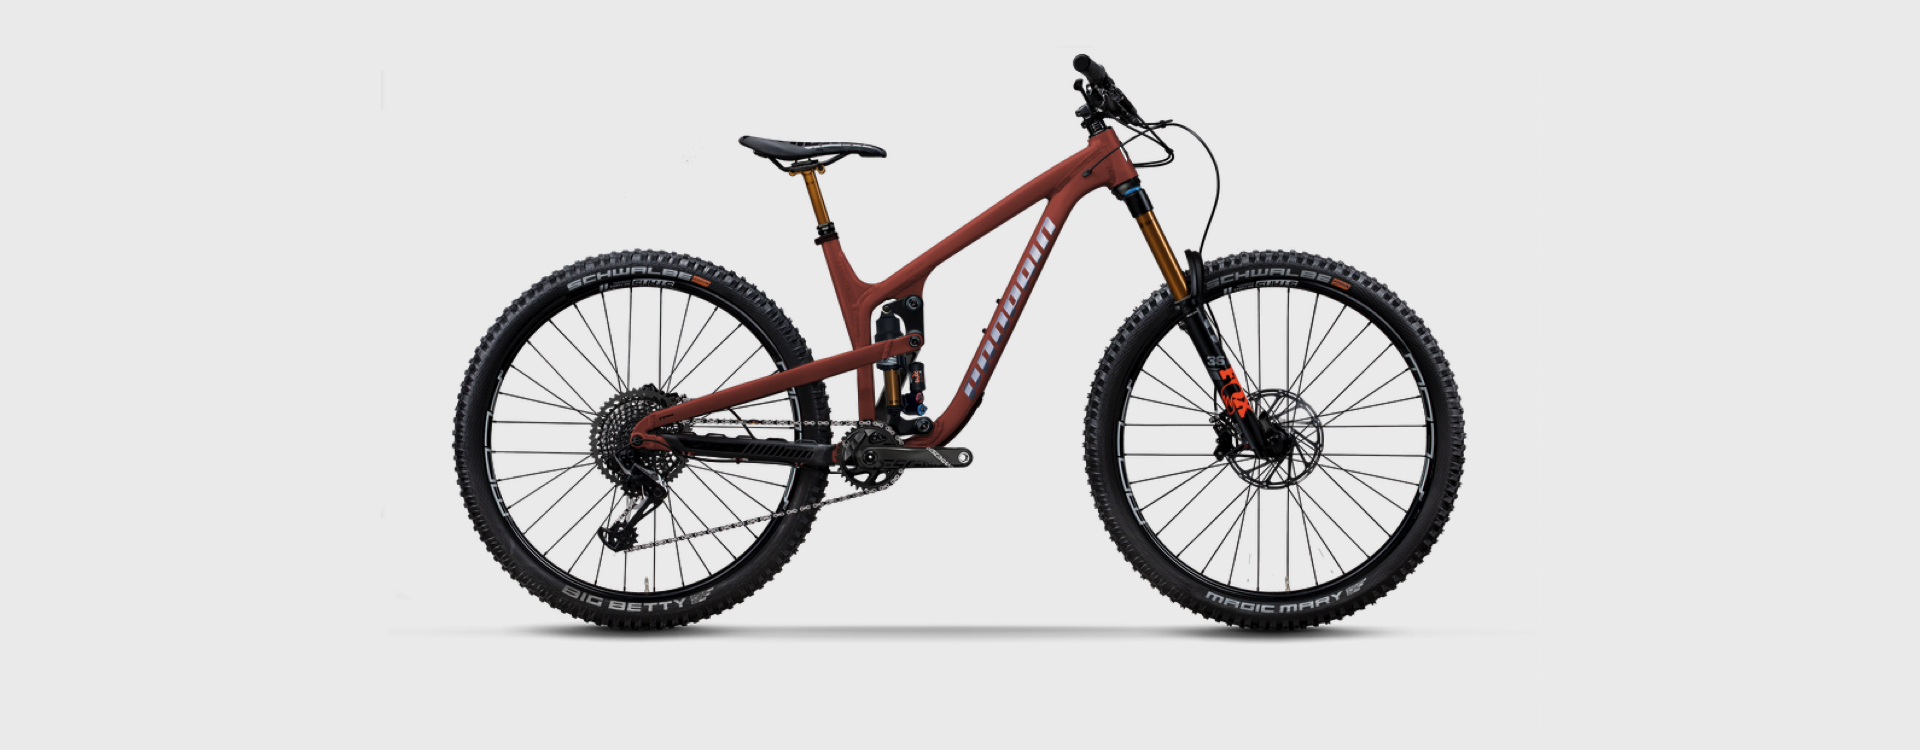 Bike Verleih Gummersbach Propain Bikes Testcenter NRW Tyee 4 - AL - L - 29 - Marsred - 1920x750